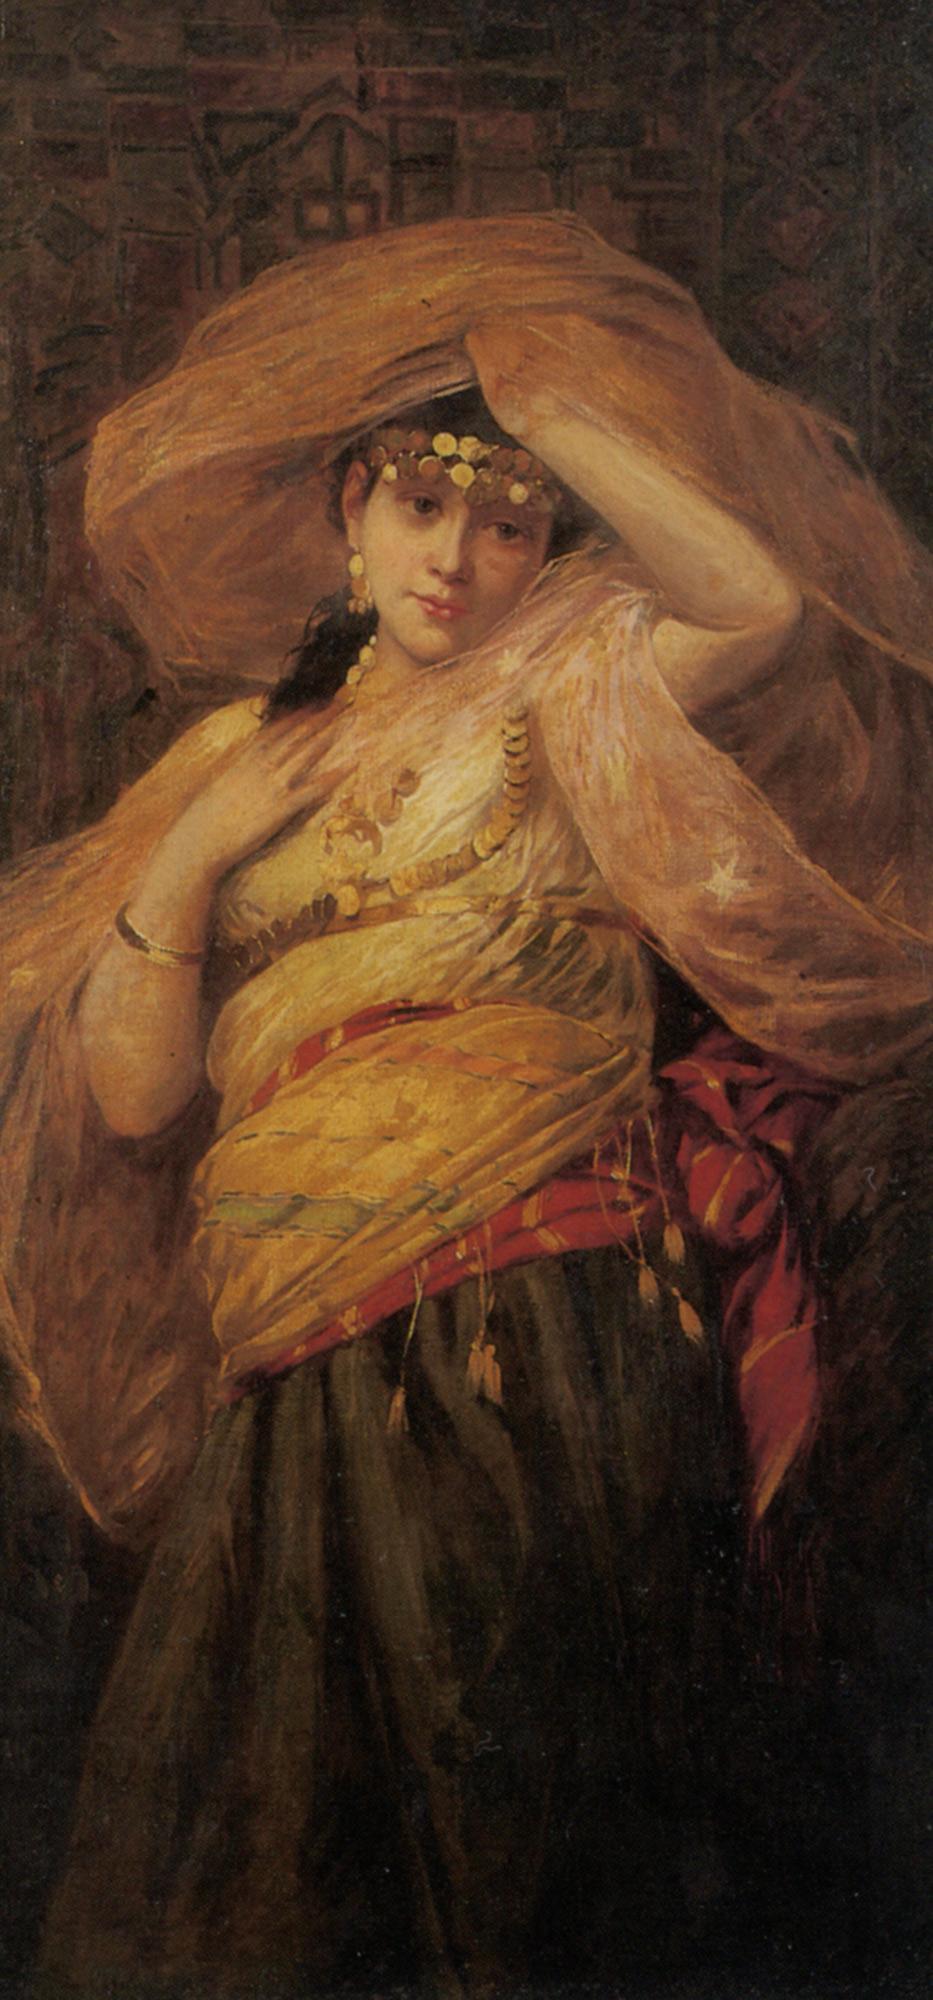 An Arab Dancer :: Giovanni Costa - Arab women (Harem Life scenes) in art  and painting ôîòî